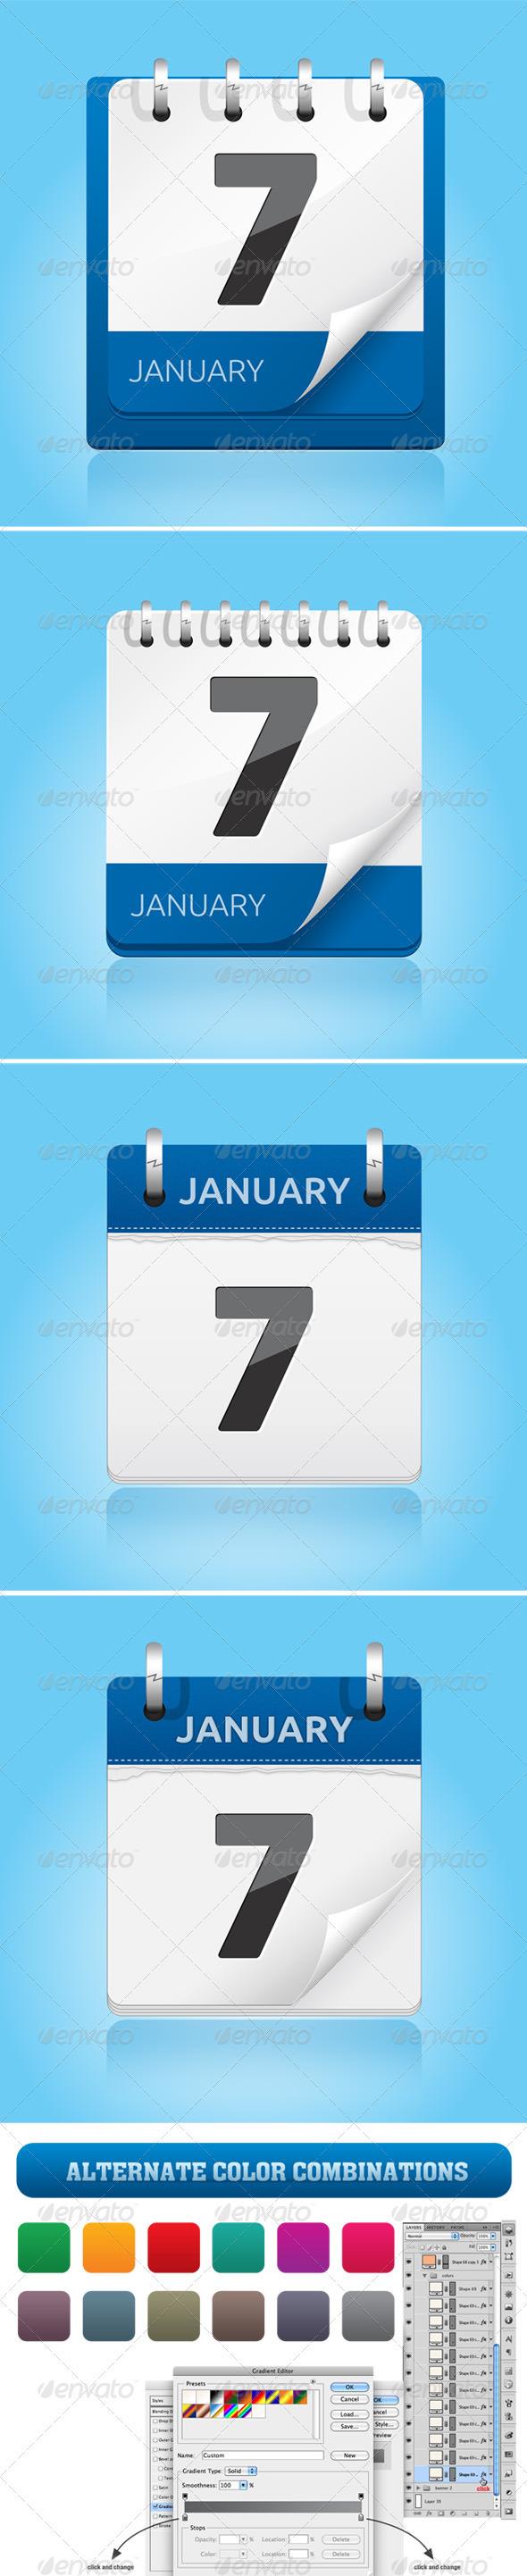 Calendar Icon - Media Icons